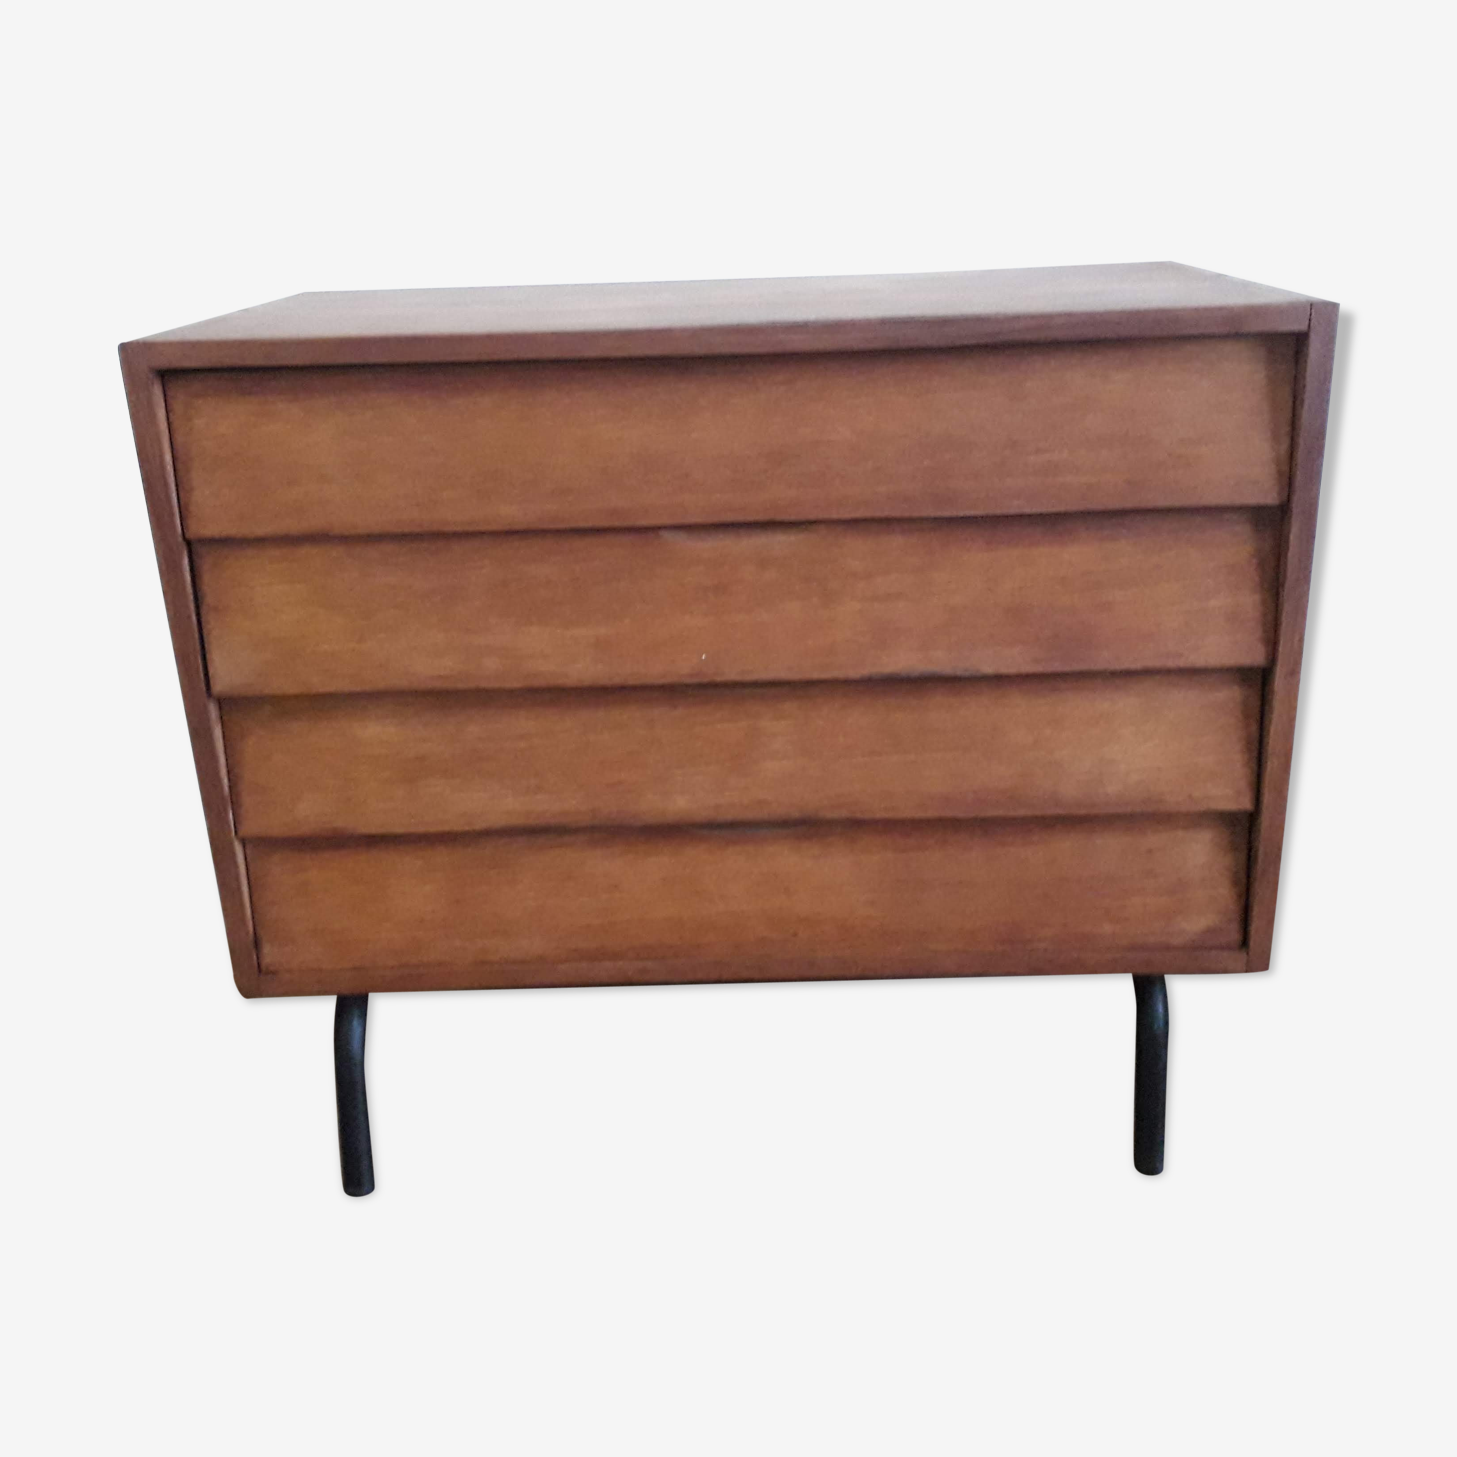 Dresser by Robert Charroy for Mobilor